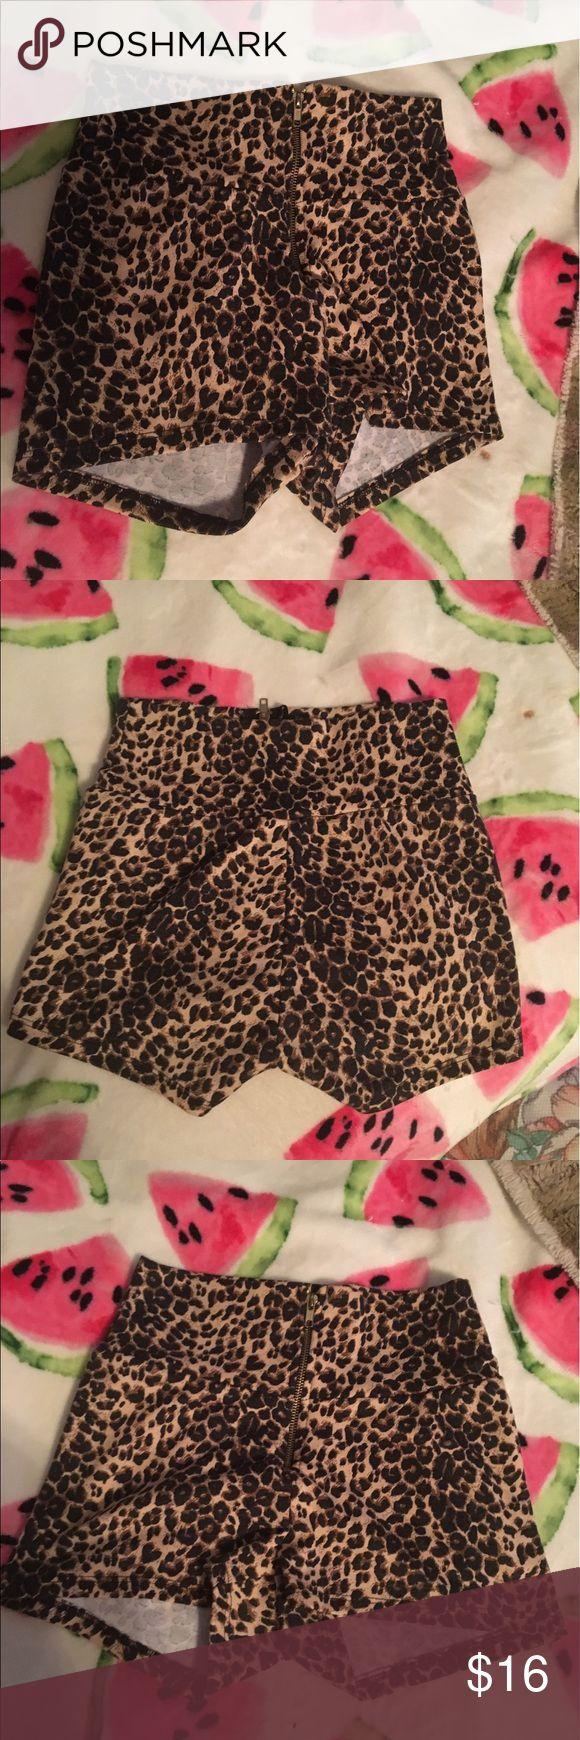 High waisted cheetah shorts size medium High waisted cheetah shorts size medium Shorts